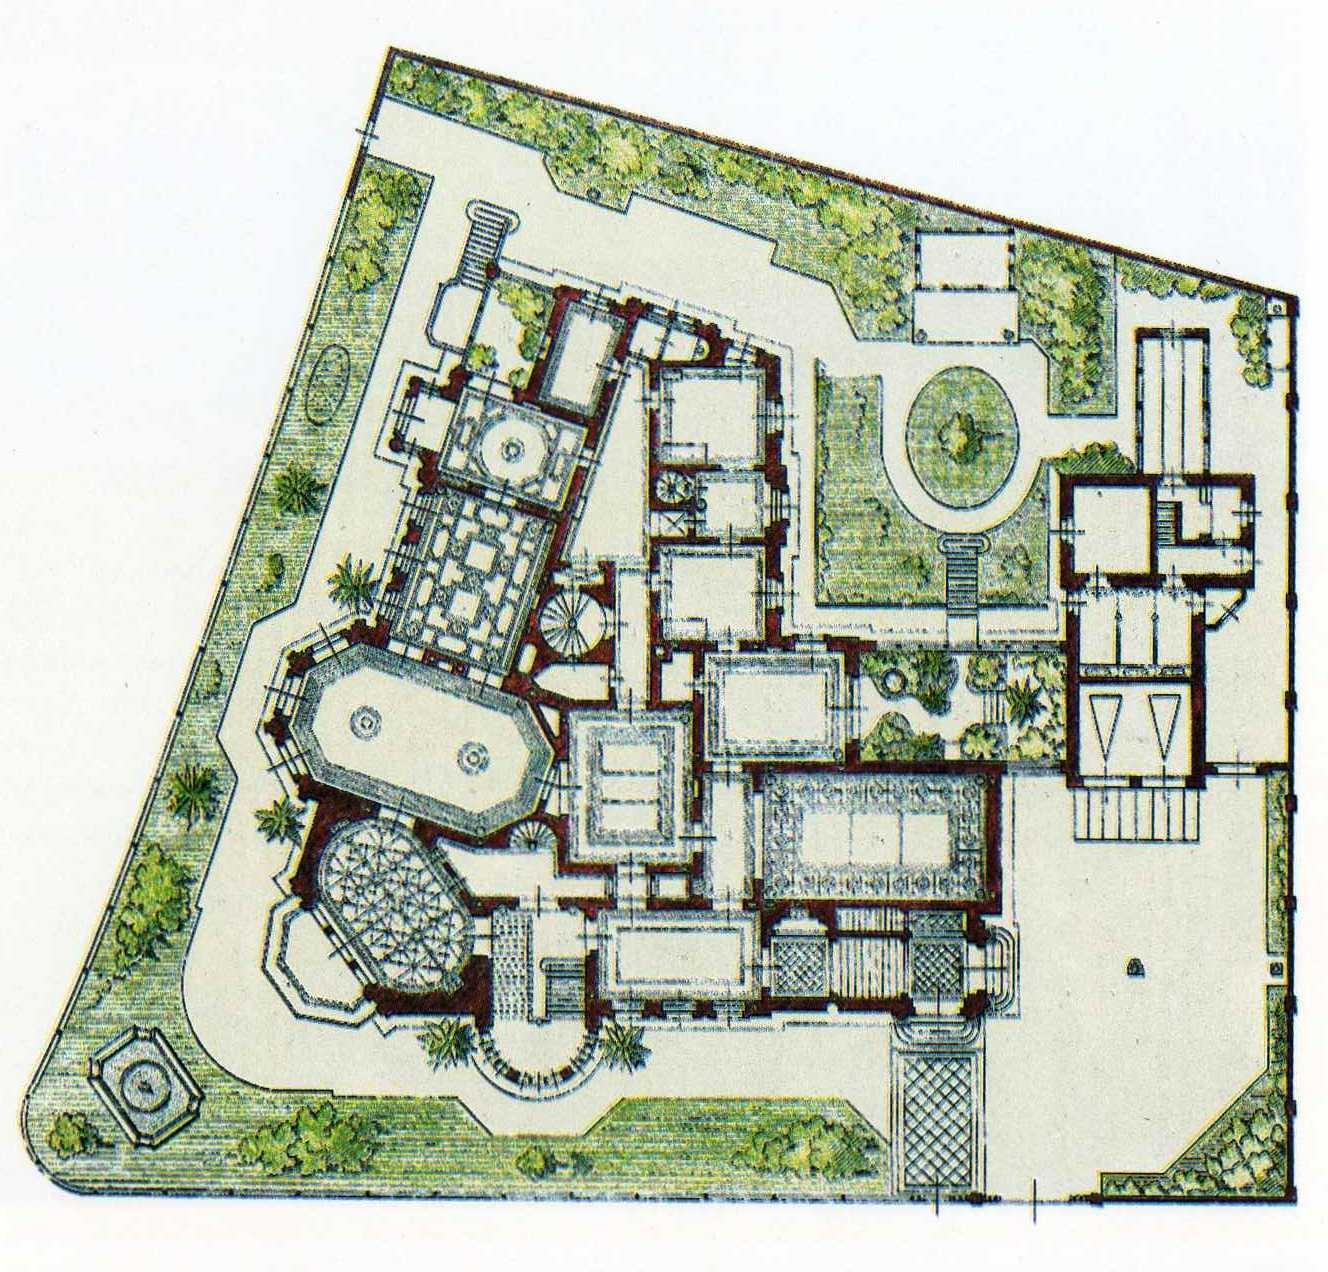 Haus beuststra e 1 dresden for Moderne villa grundriss